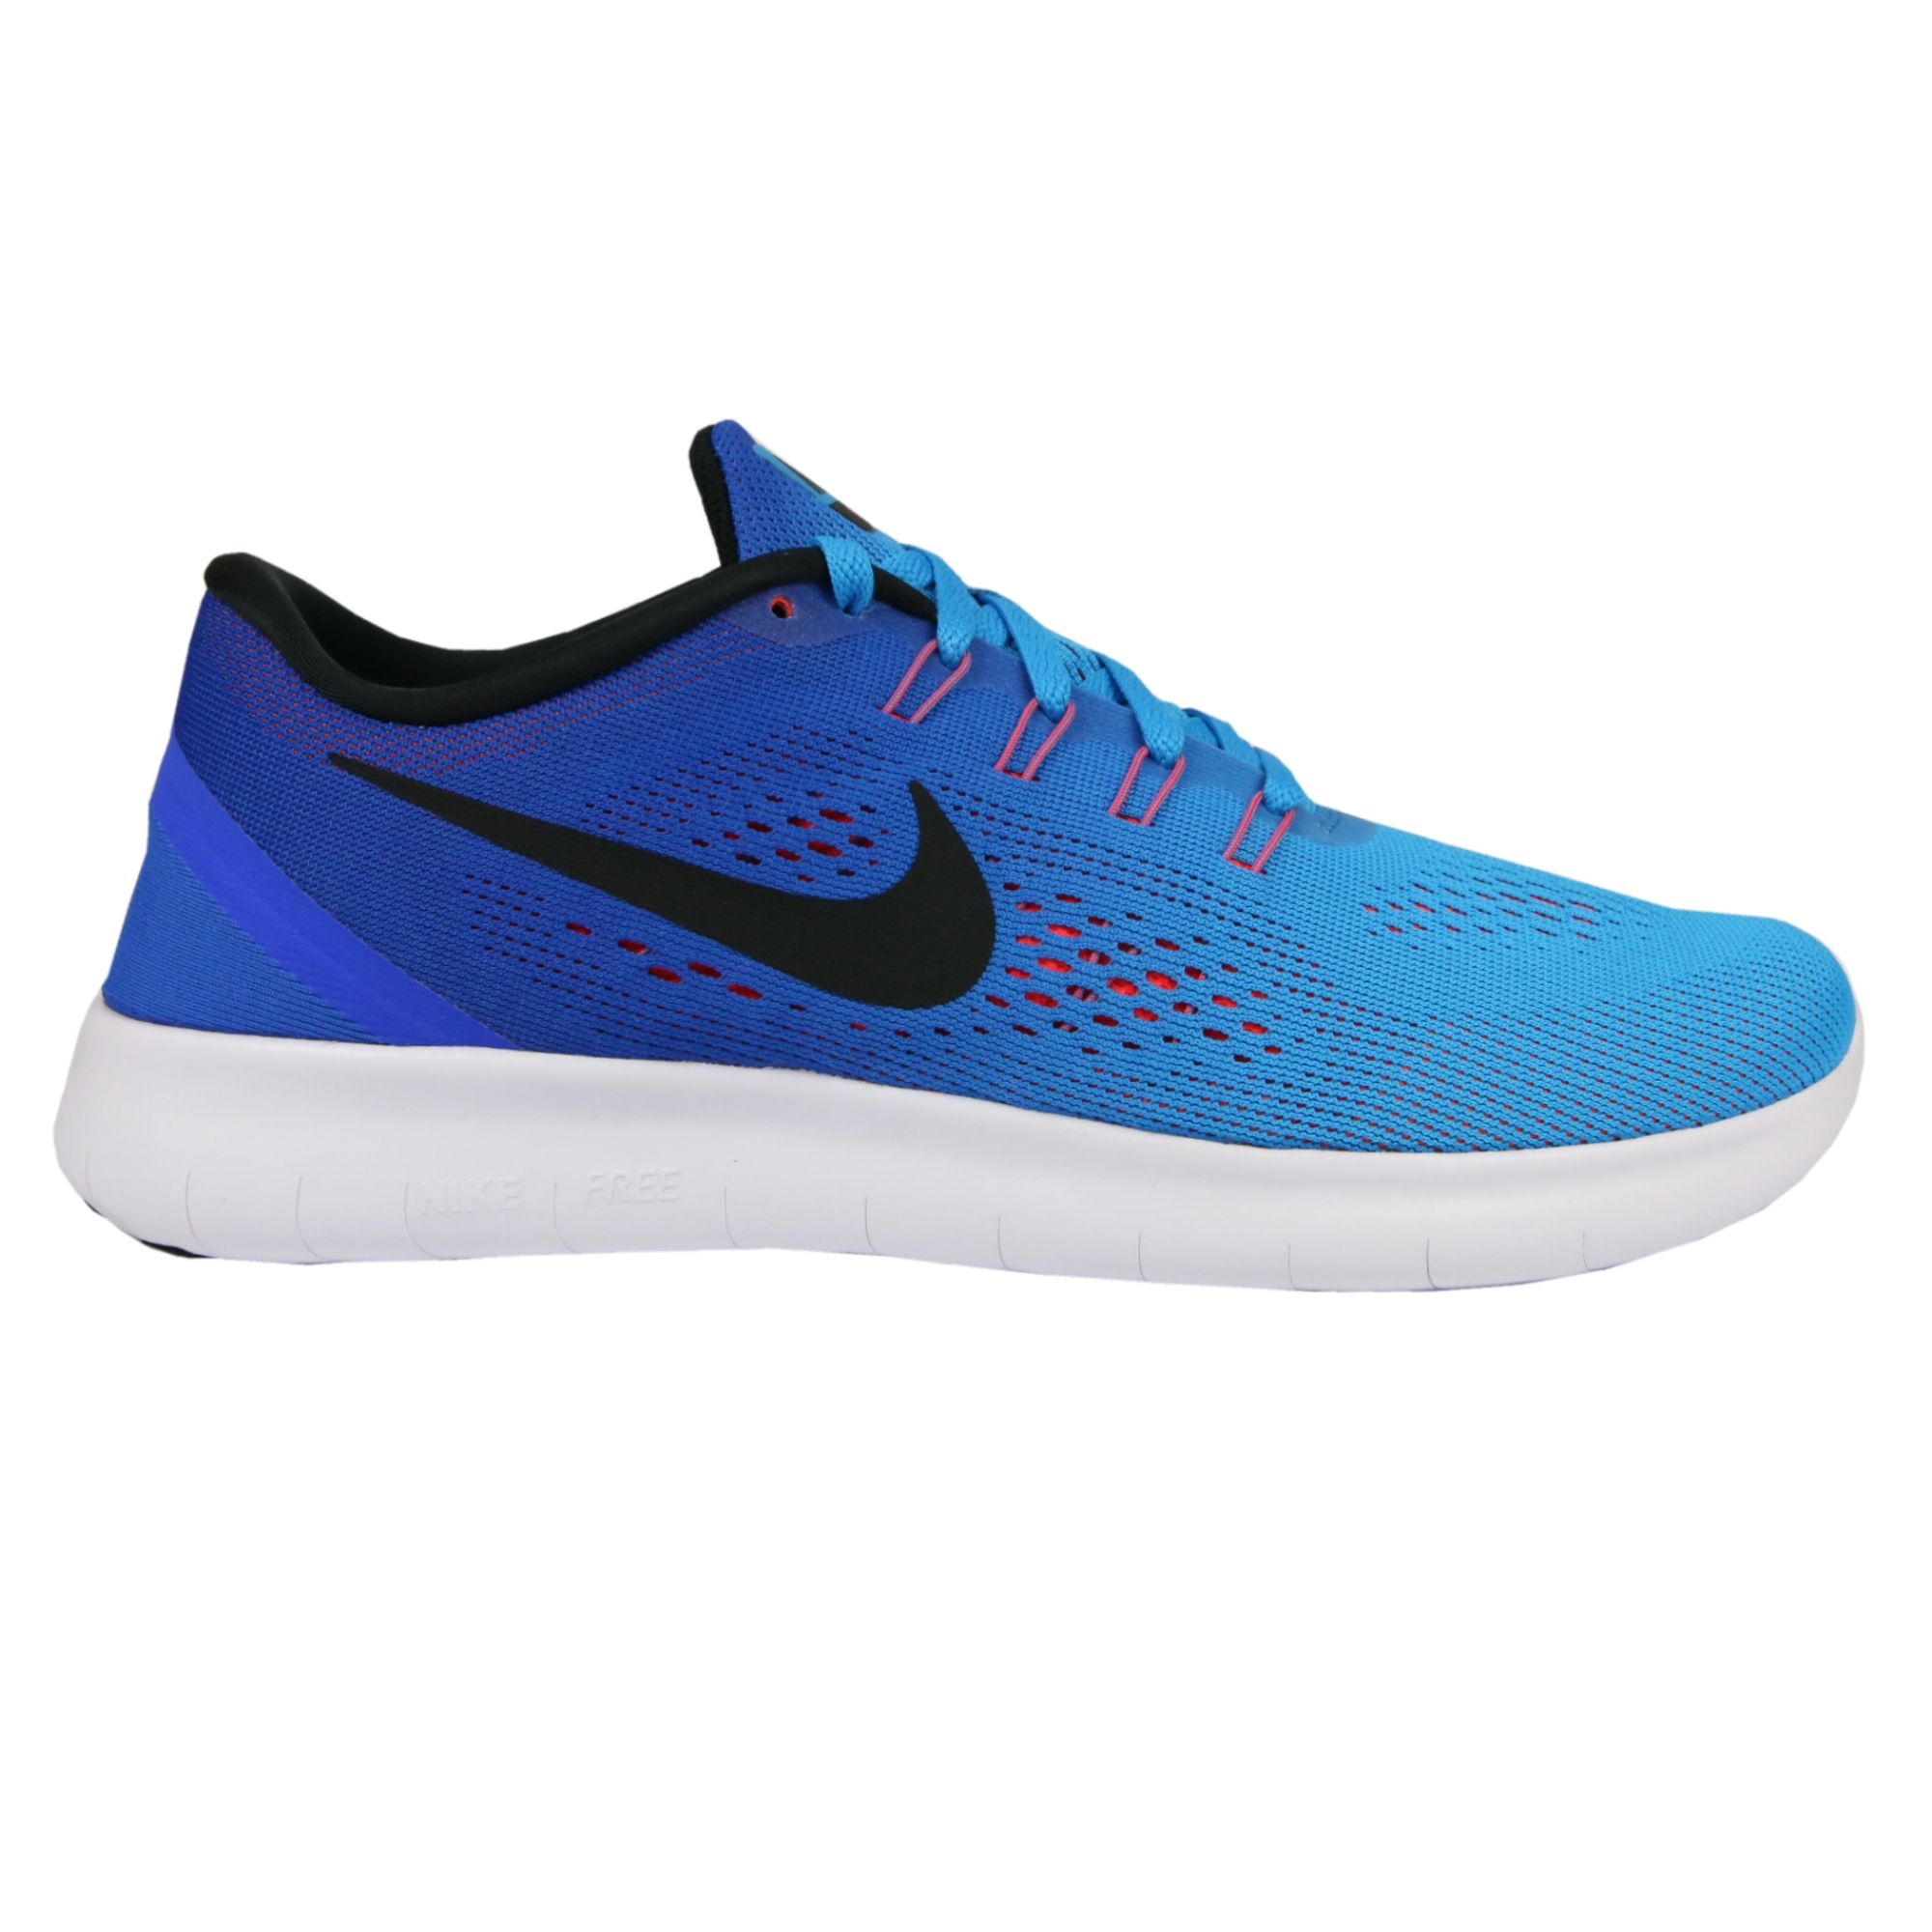 Nike-Free-RN-Run-Schuhe-Laufschuhe-Running-Fitness-Turnschuhe-Sneaker-Herren